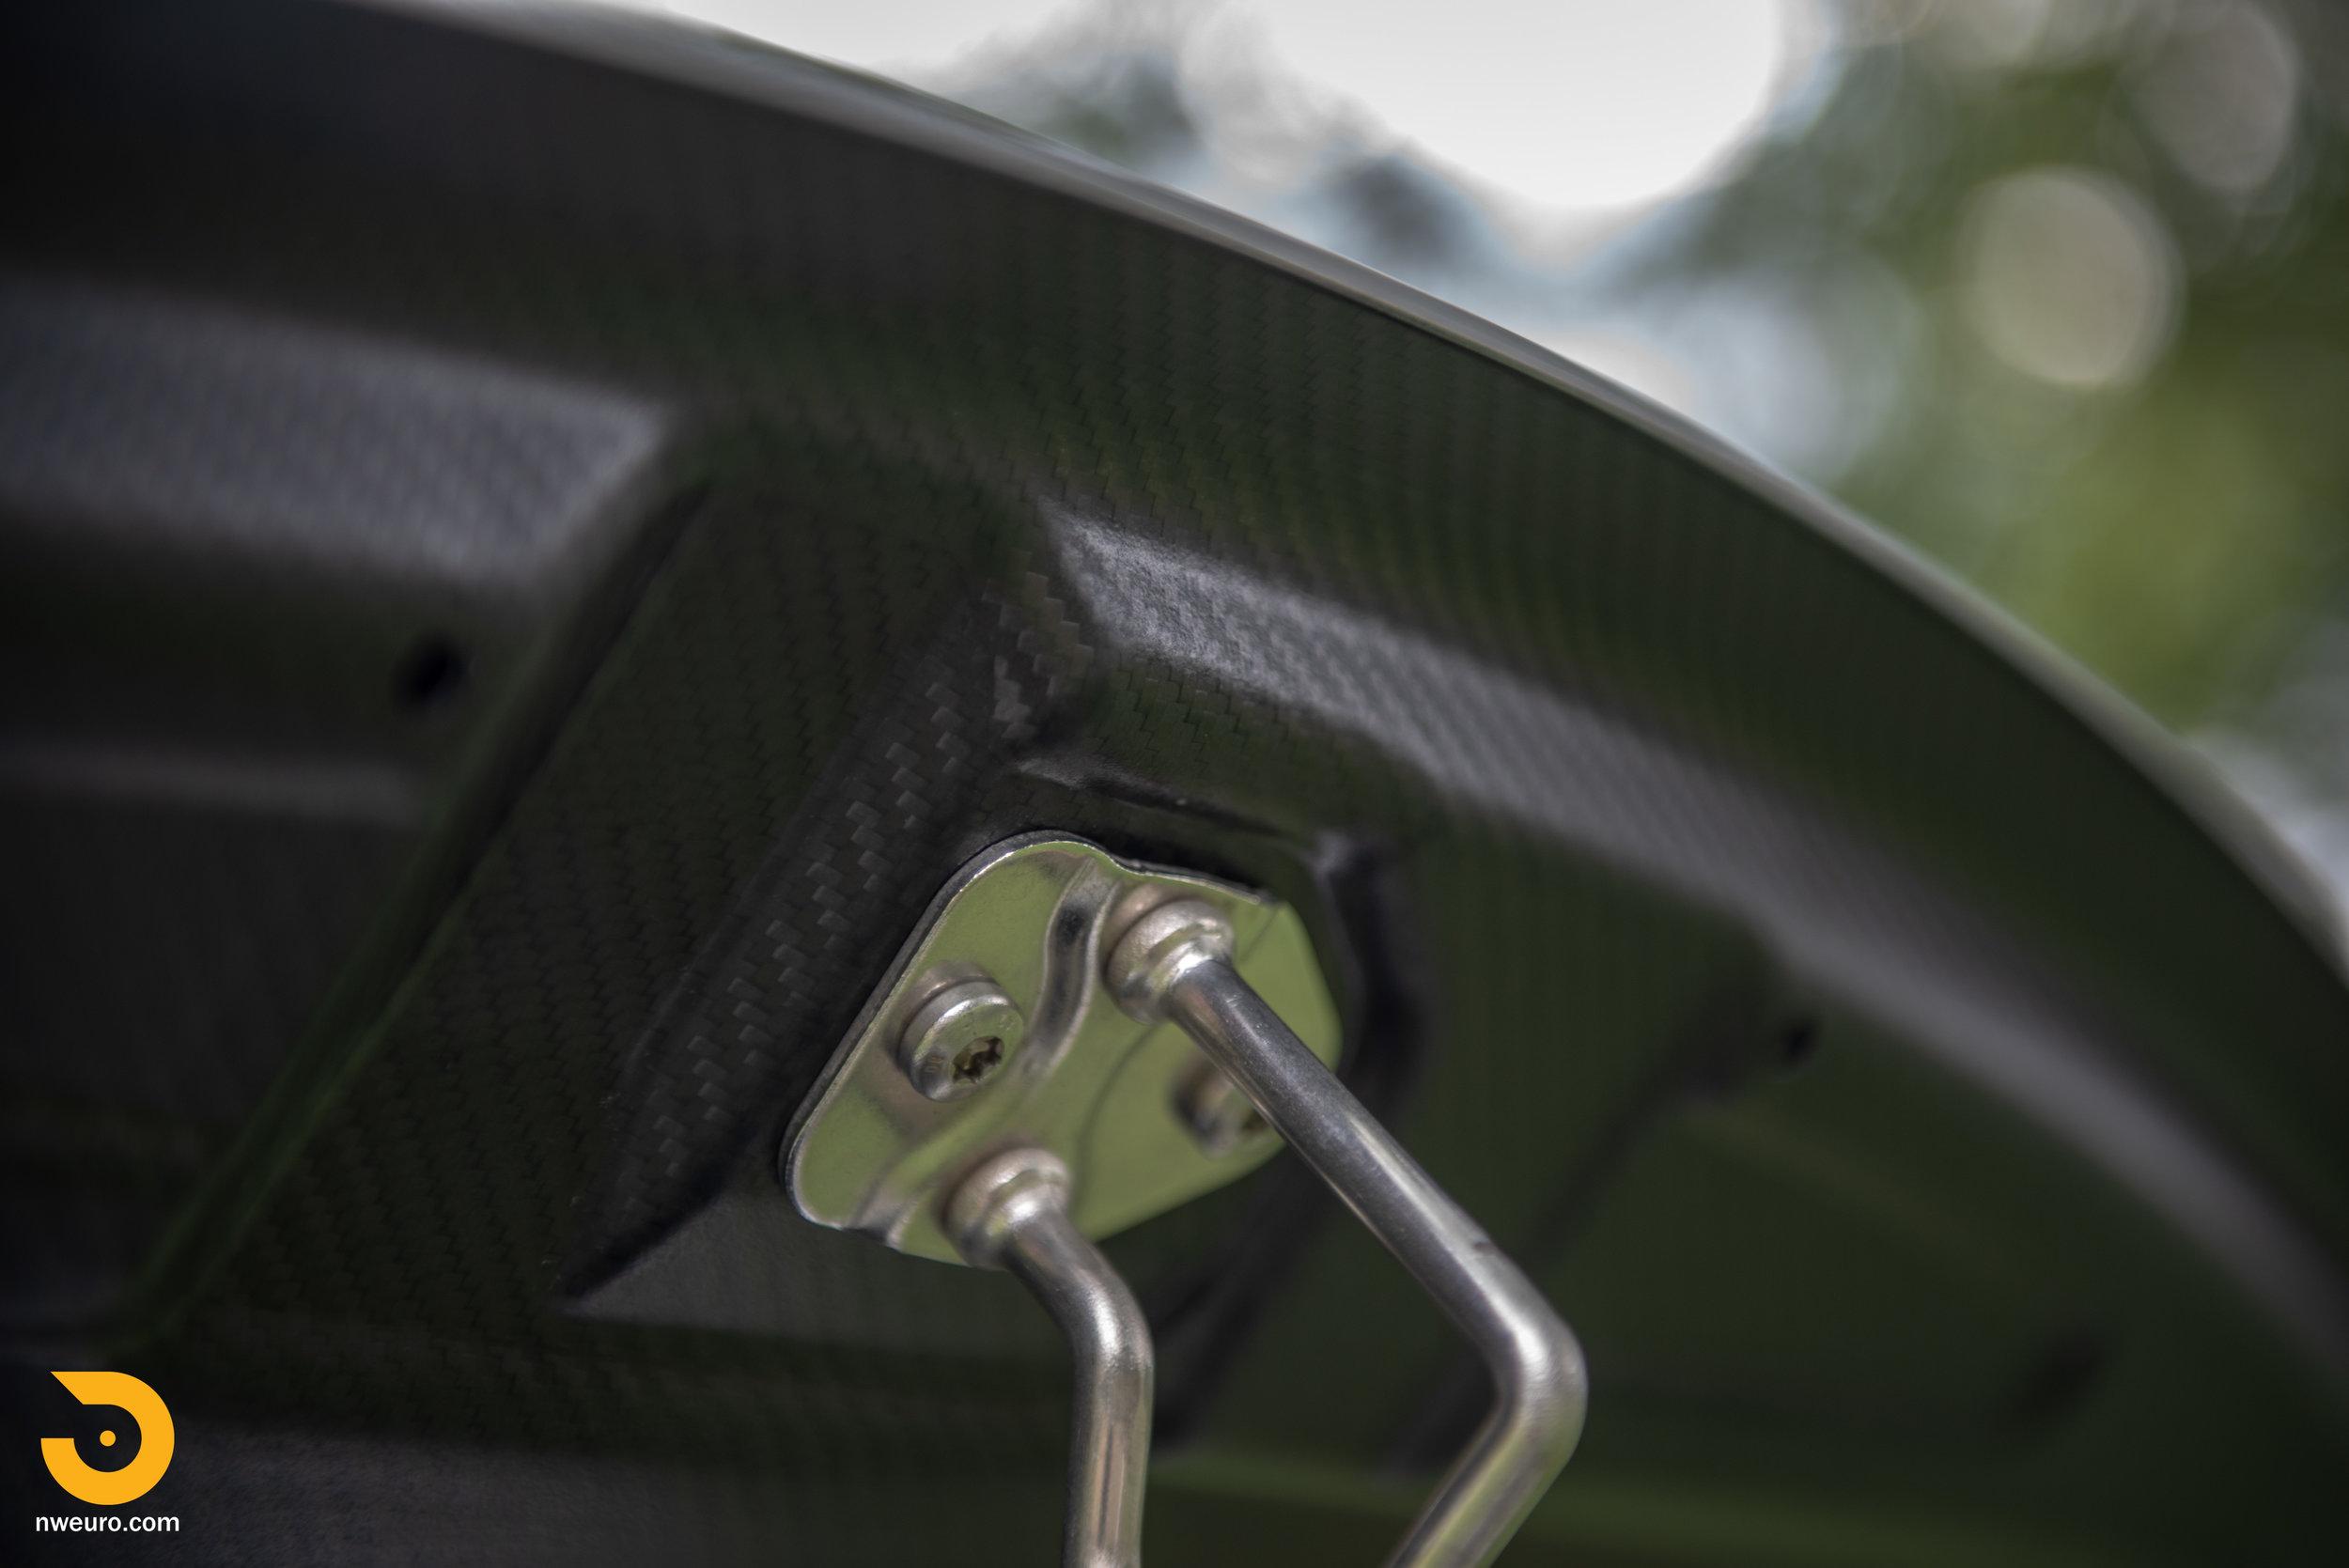 2019 Porsche GT3 RS - Chalk-52.jpg